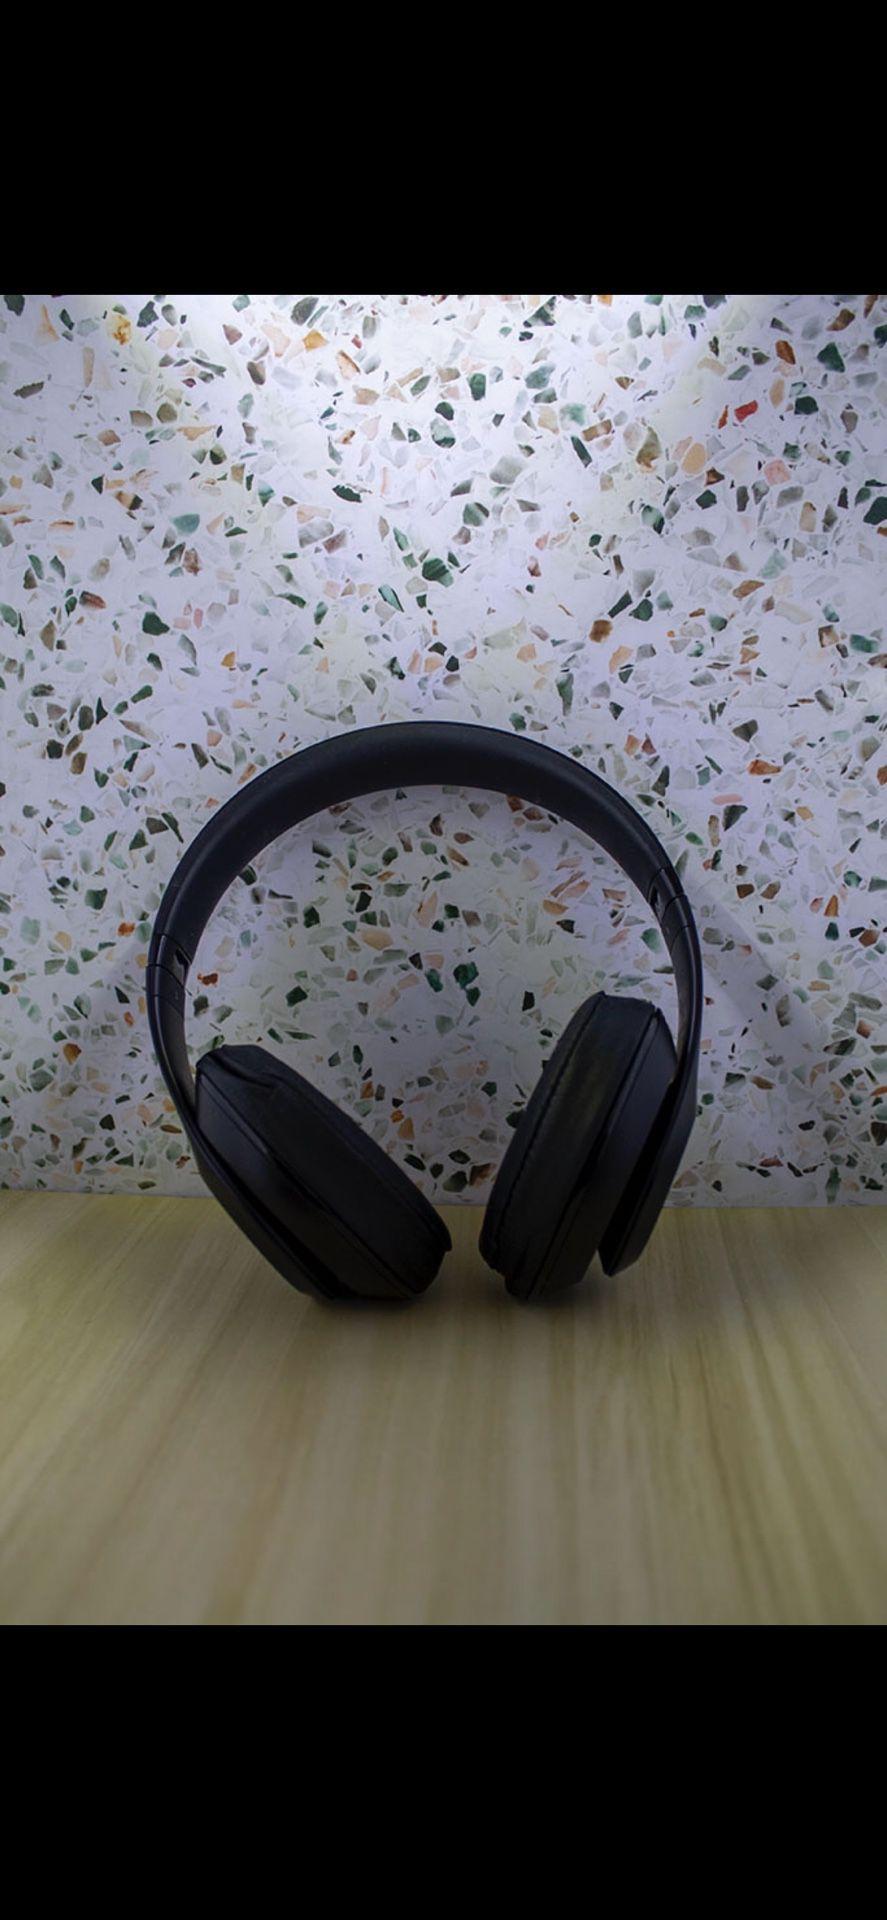 Beats Wireless Bluetooth Headphones